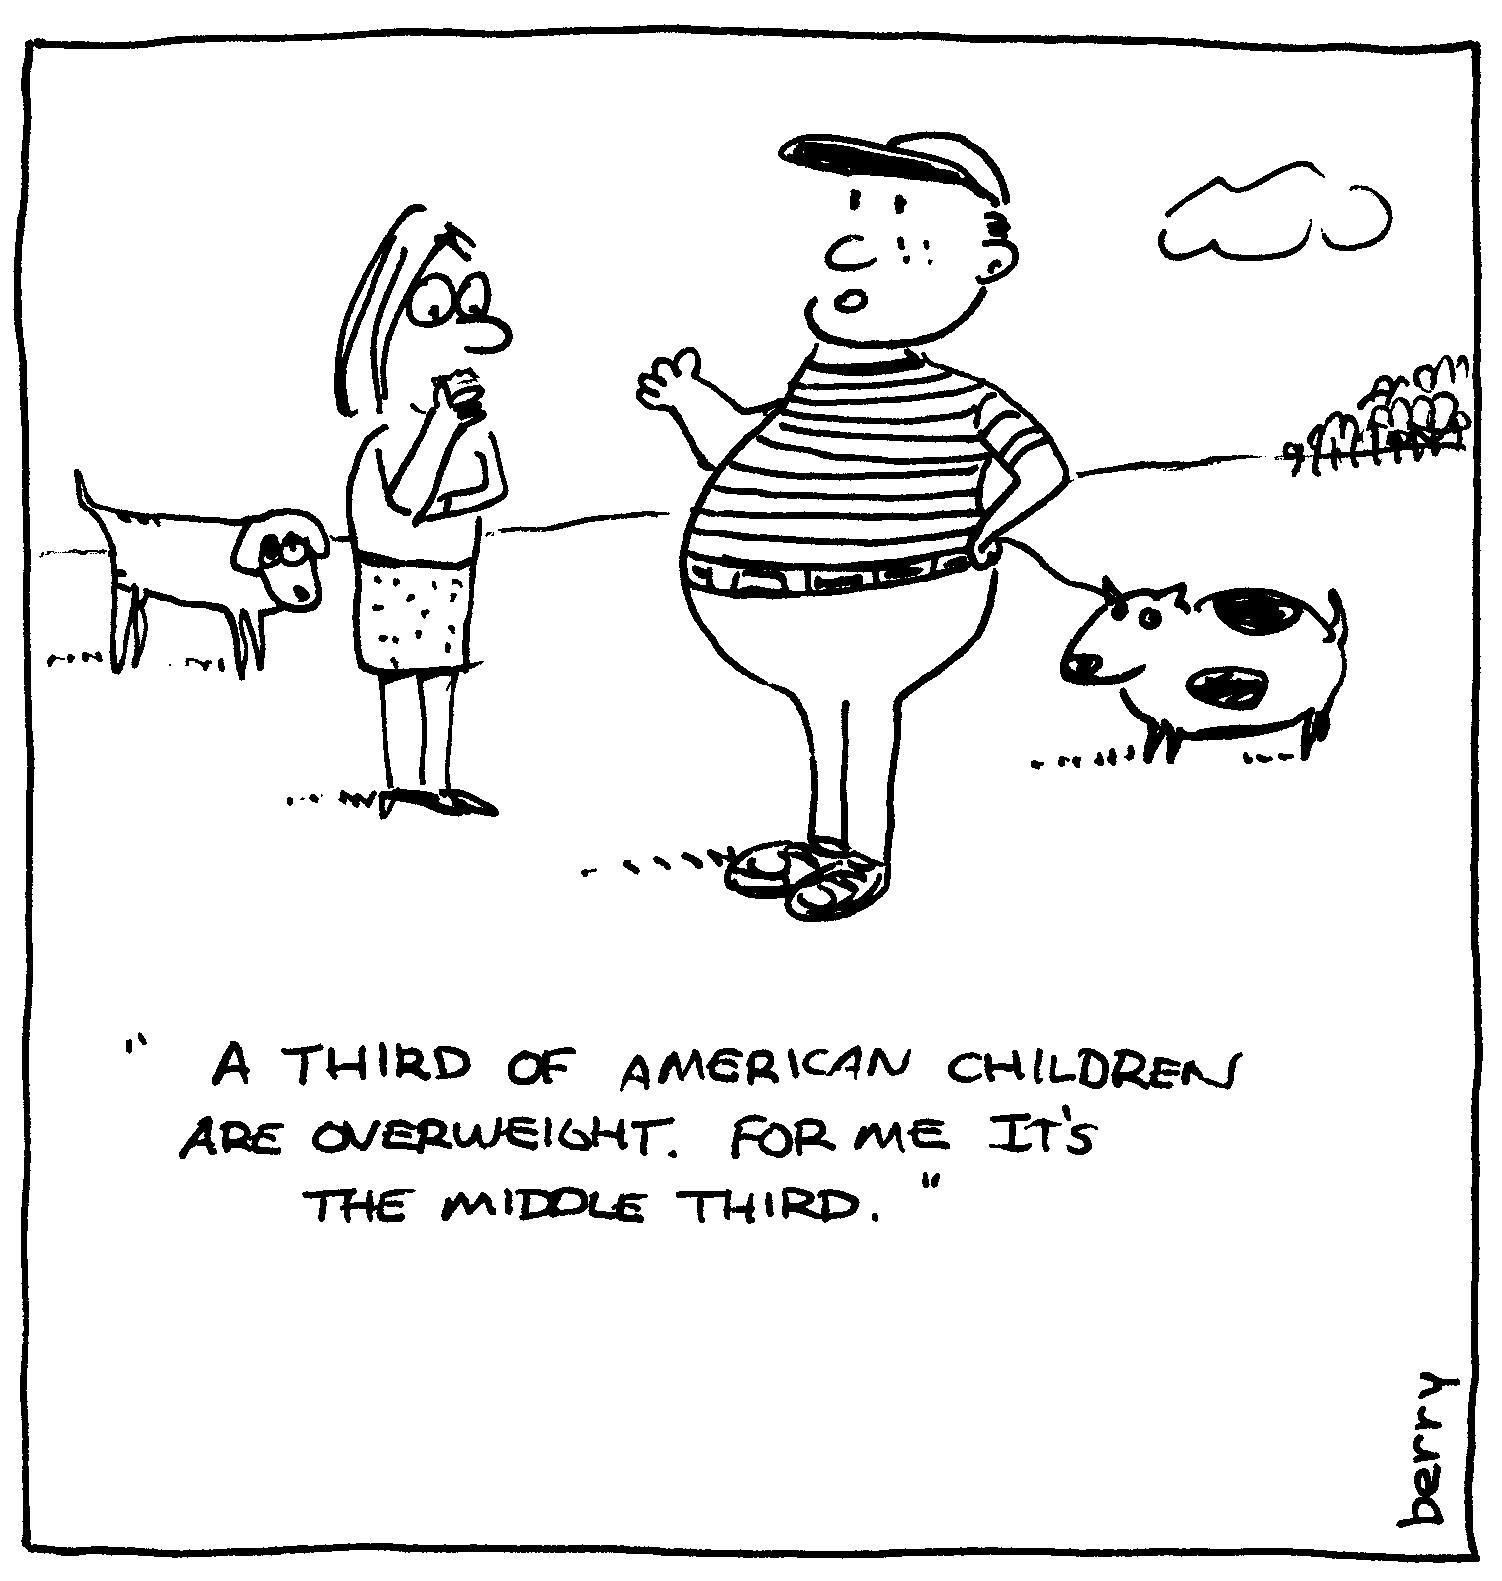 berry cartoons: childhood obesity cartoon